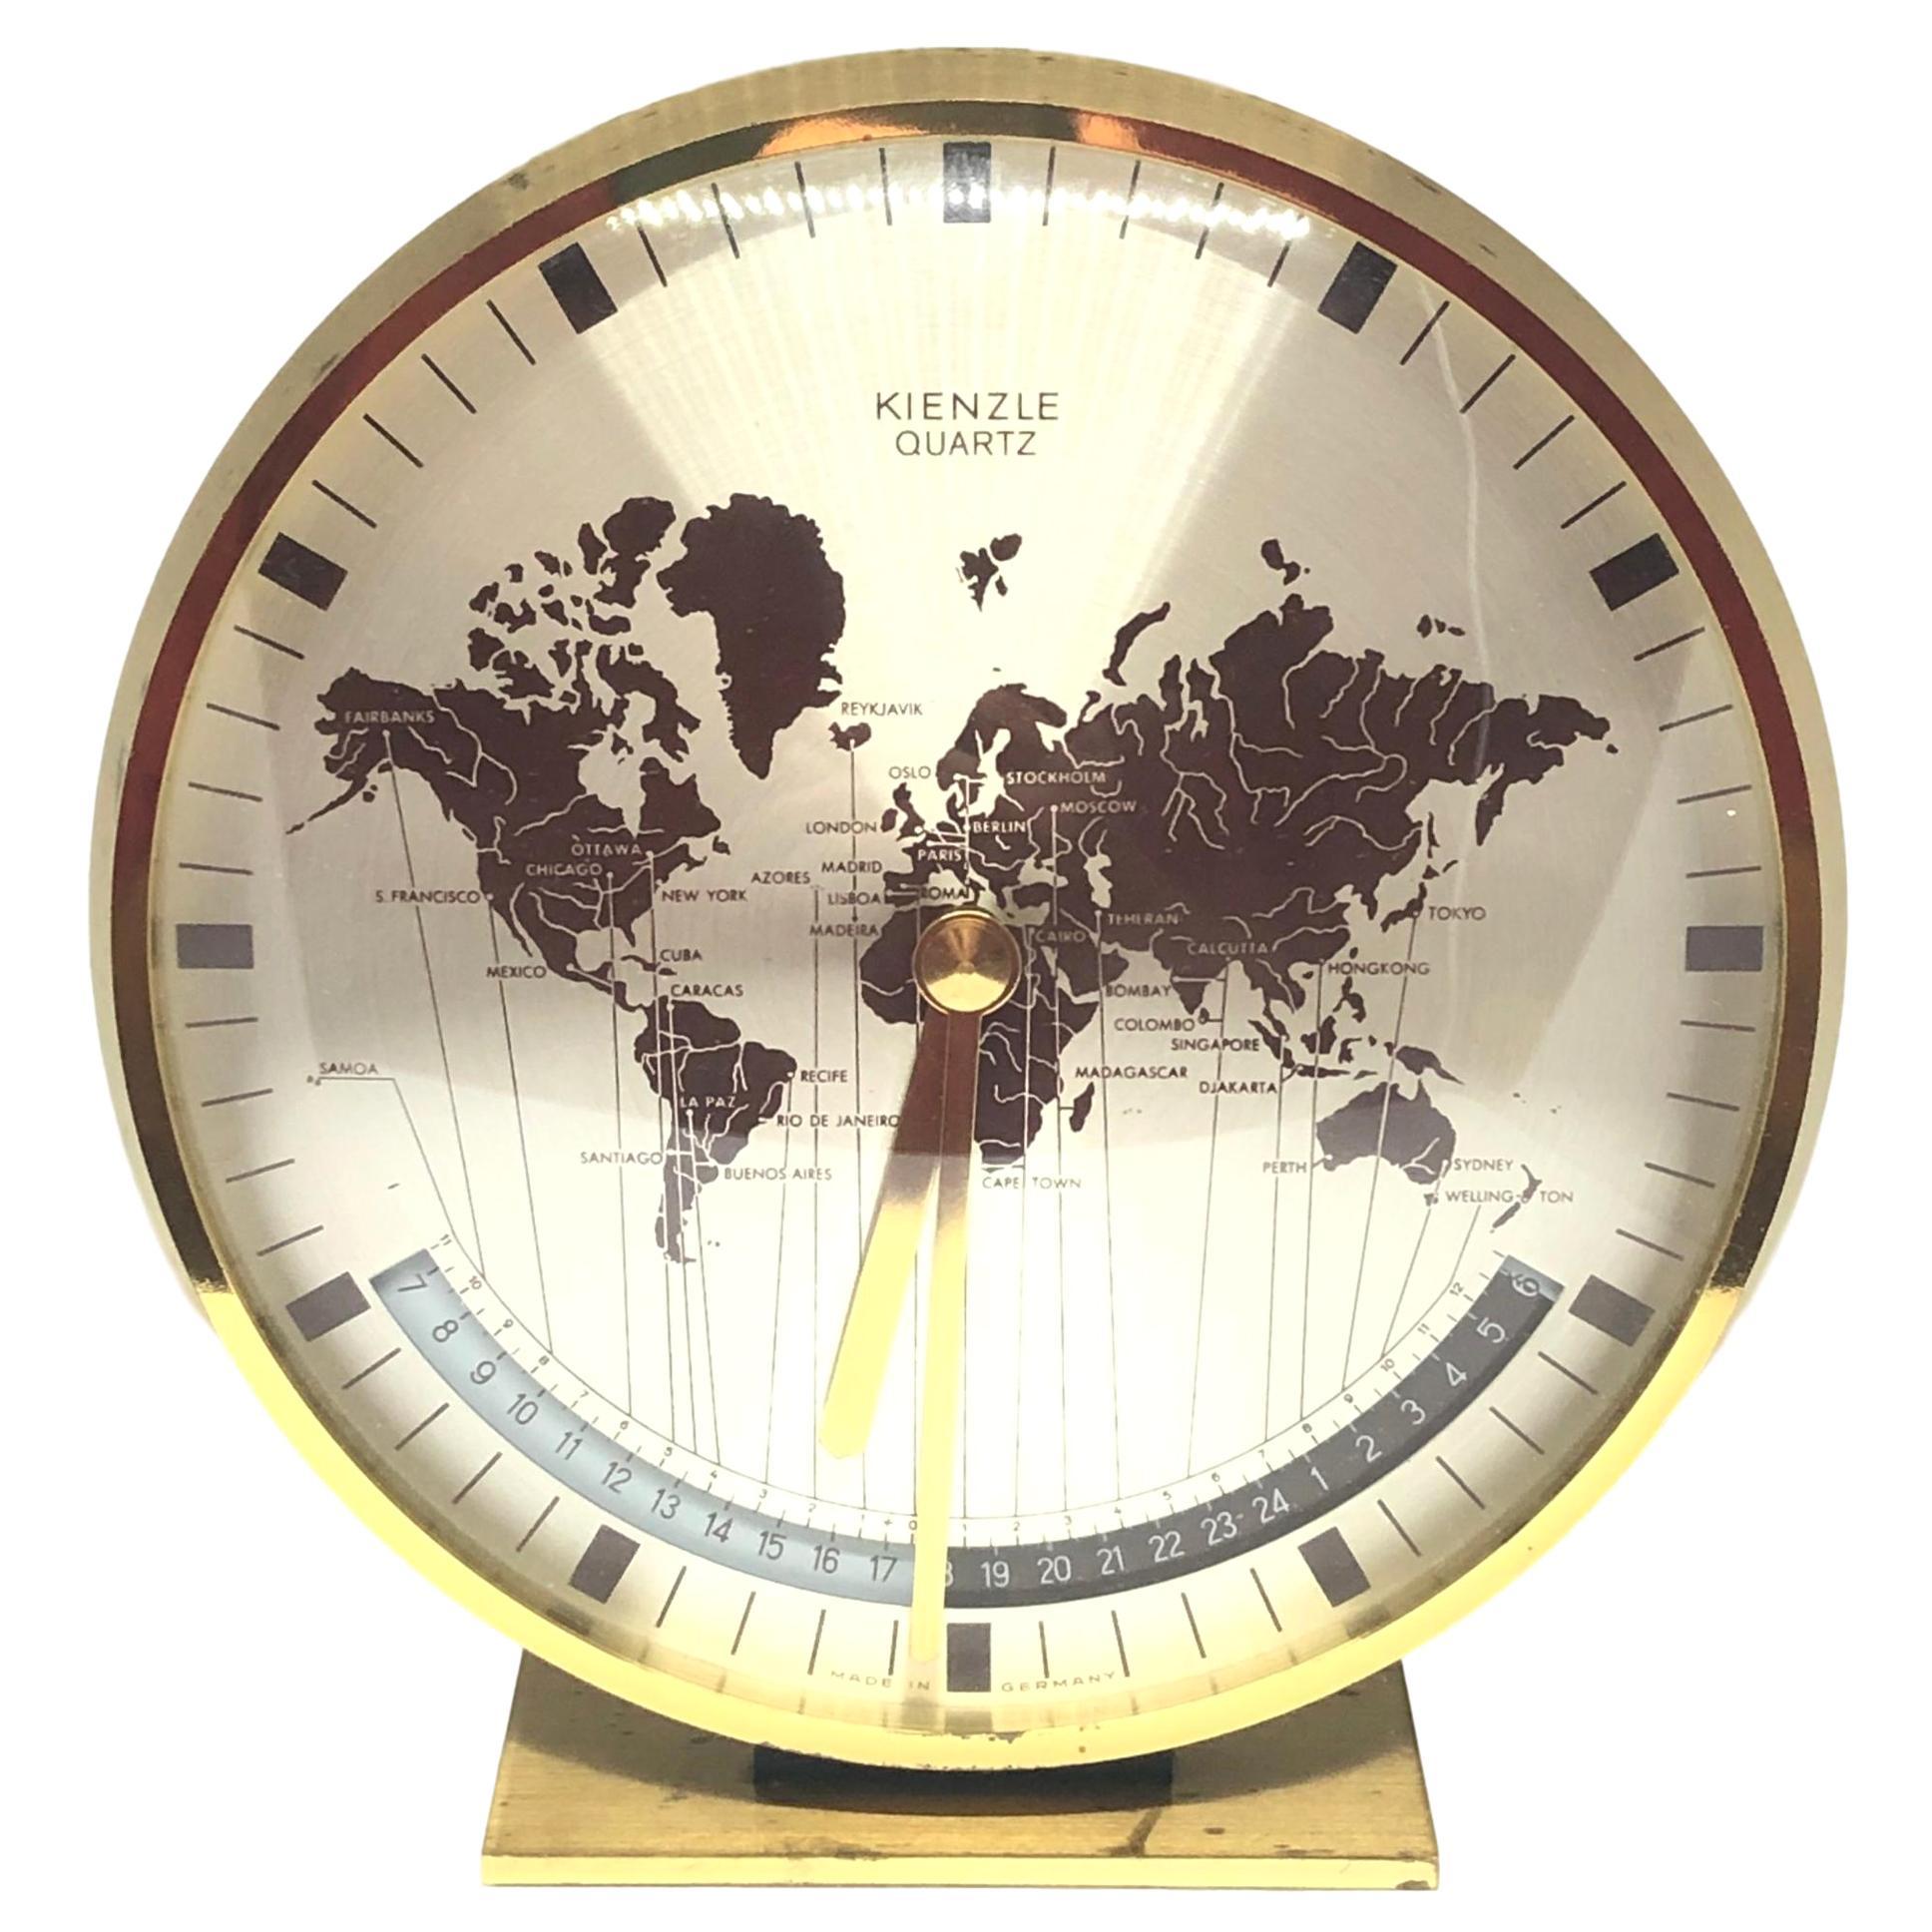 Midcentury Kienzle GMT World Time Zone Brass Table Clock, Germany, 1960s